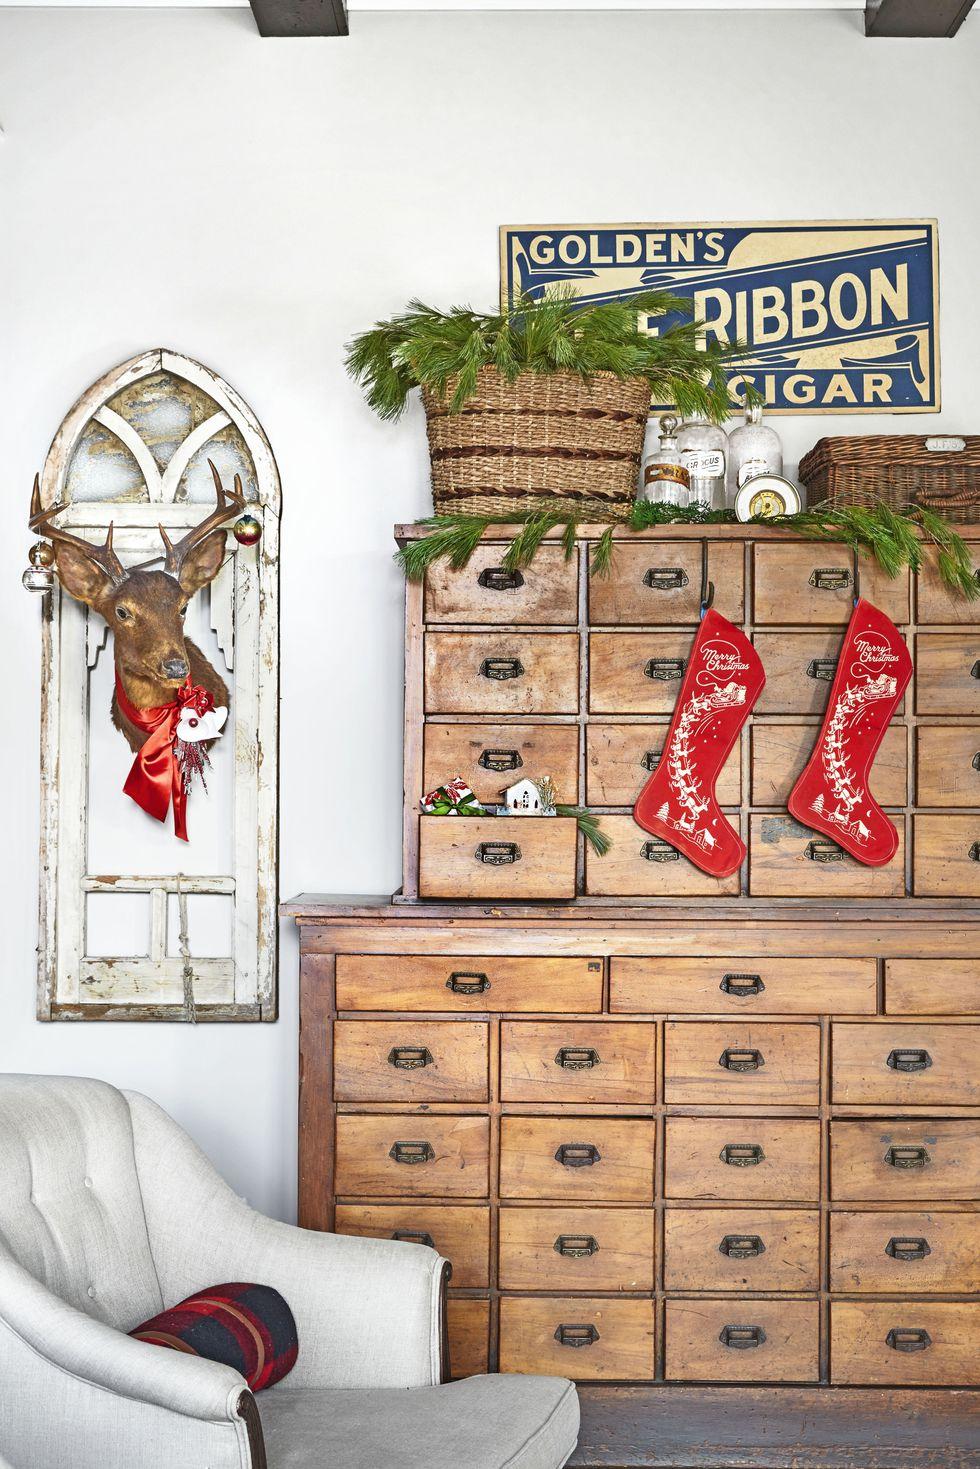 spirit-christmas-past-hang-with-care-stockings-deer-head-1216.jpg